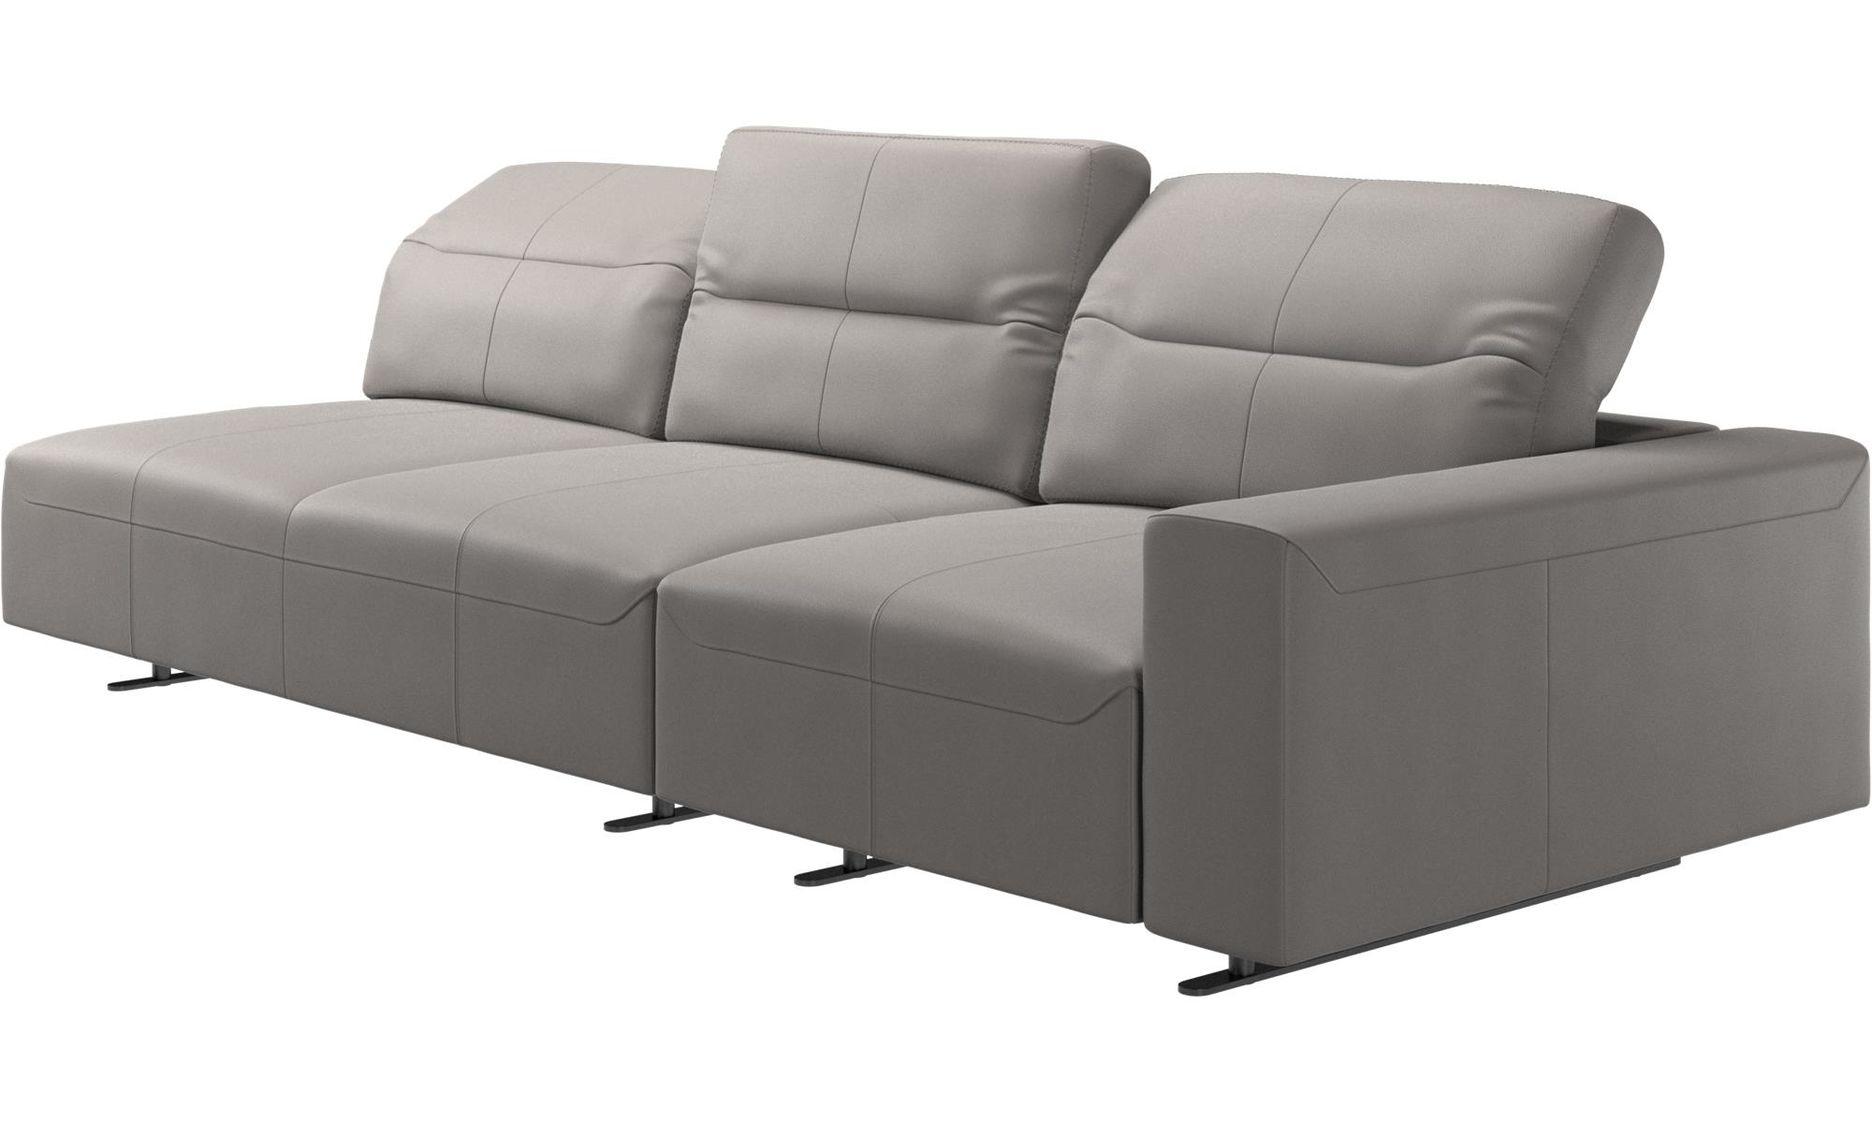 Hampton Sofa With Adjustable Back – Goodglance Throughout Hamptons Sofas (View 3 of 15)